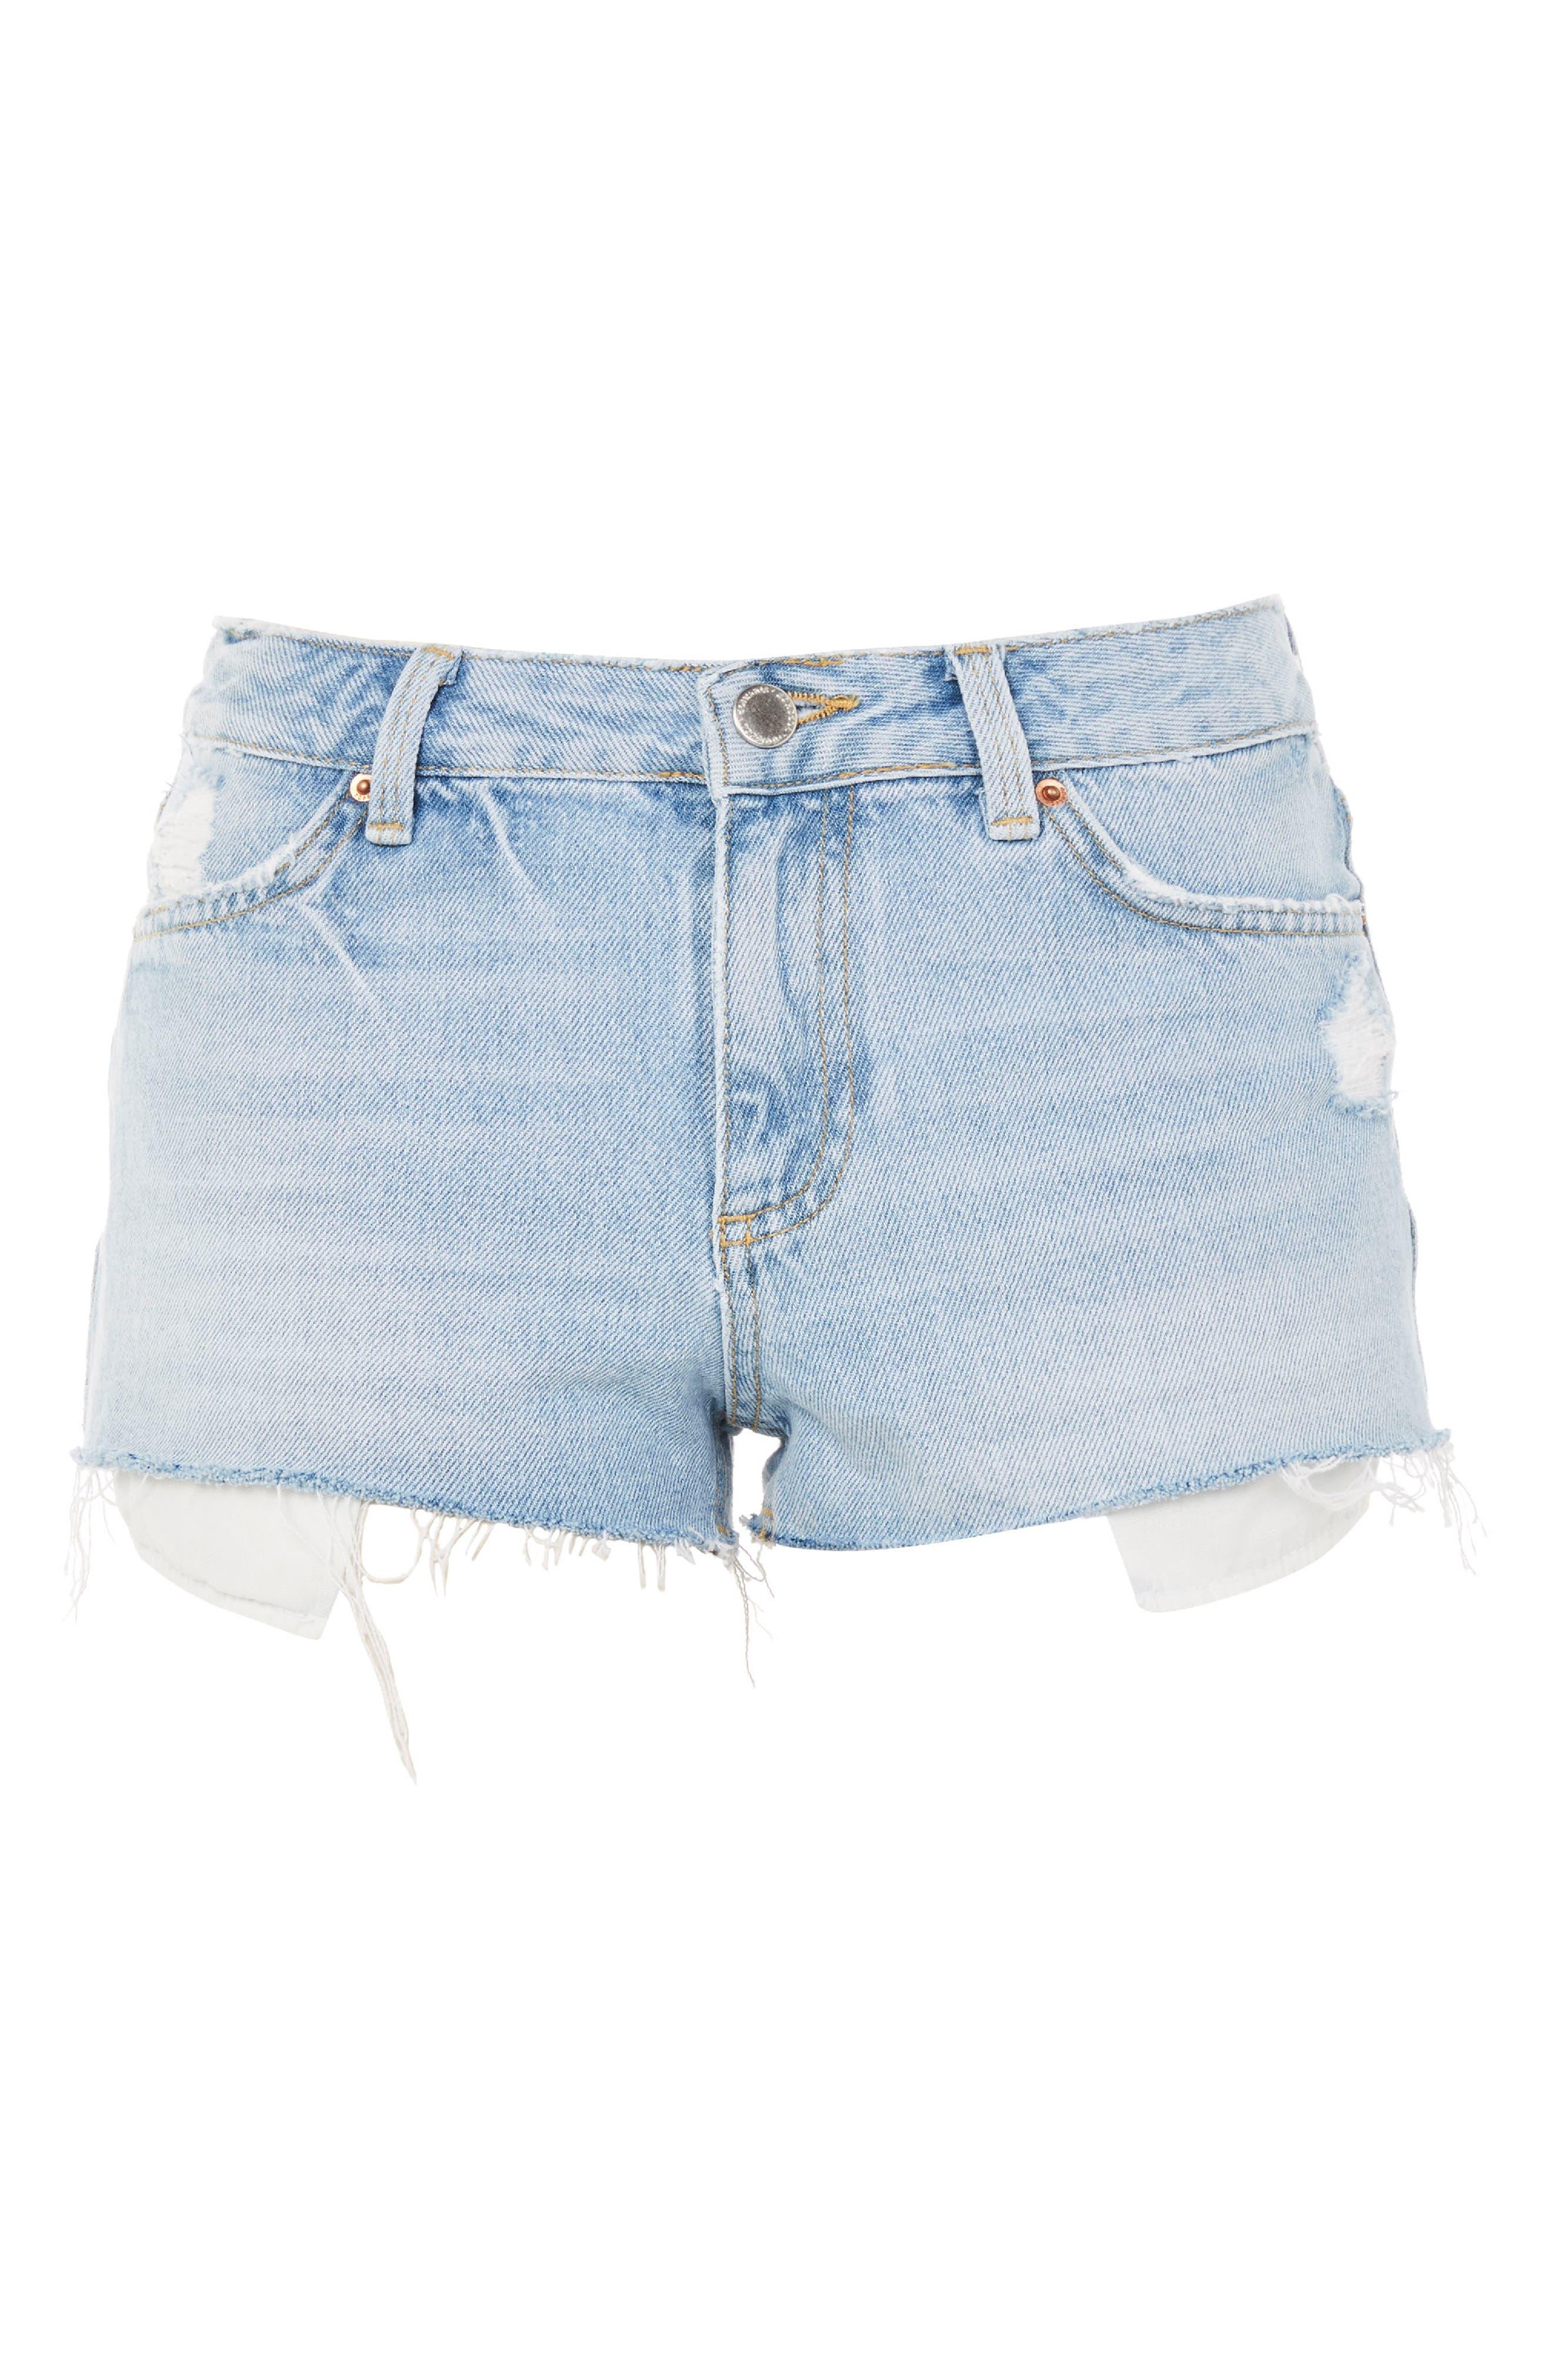 Cory Light Denim Shorts,                             Alternate thumbnail 3, color,                             Light Denim